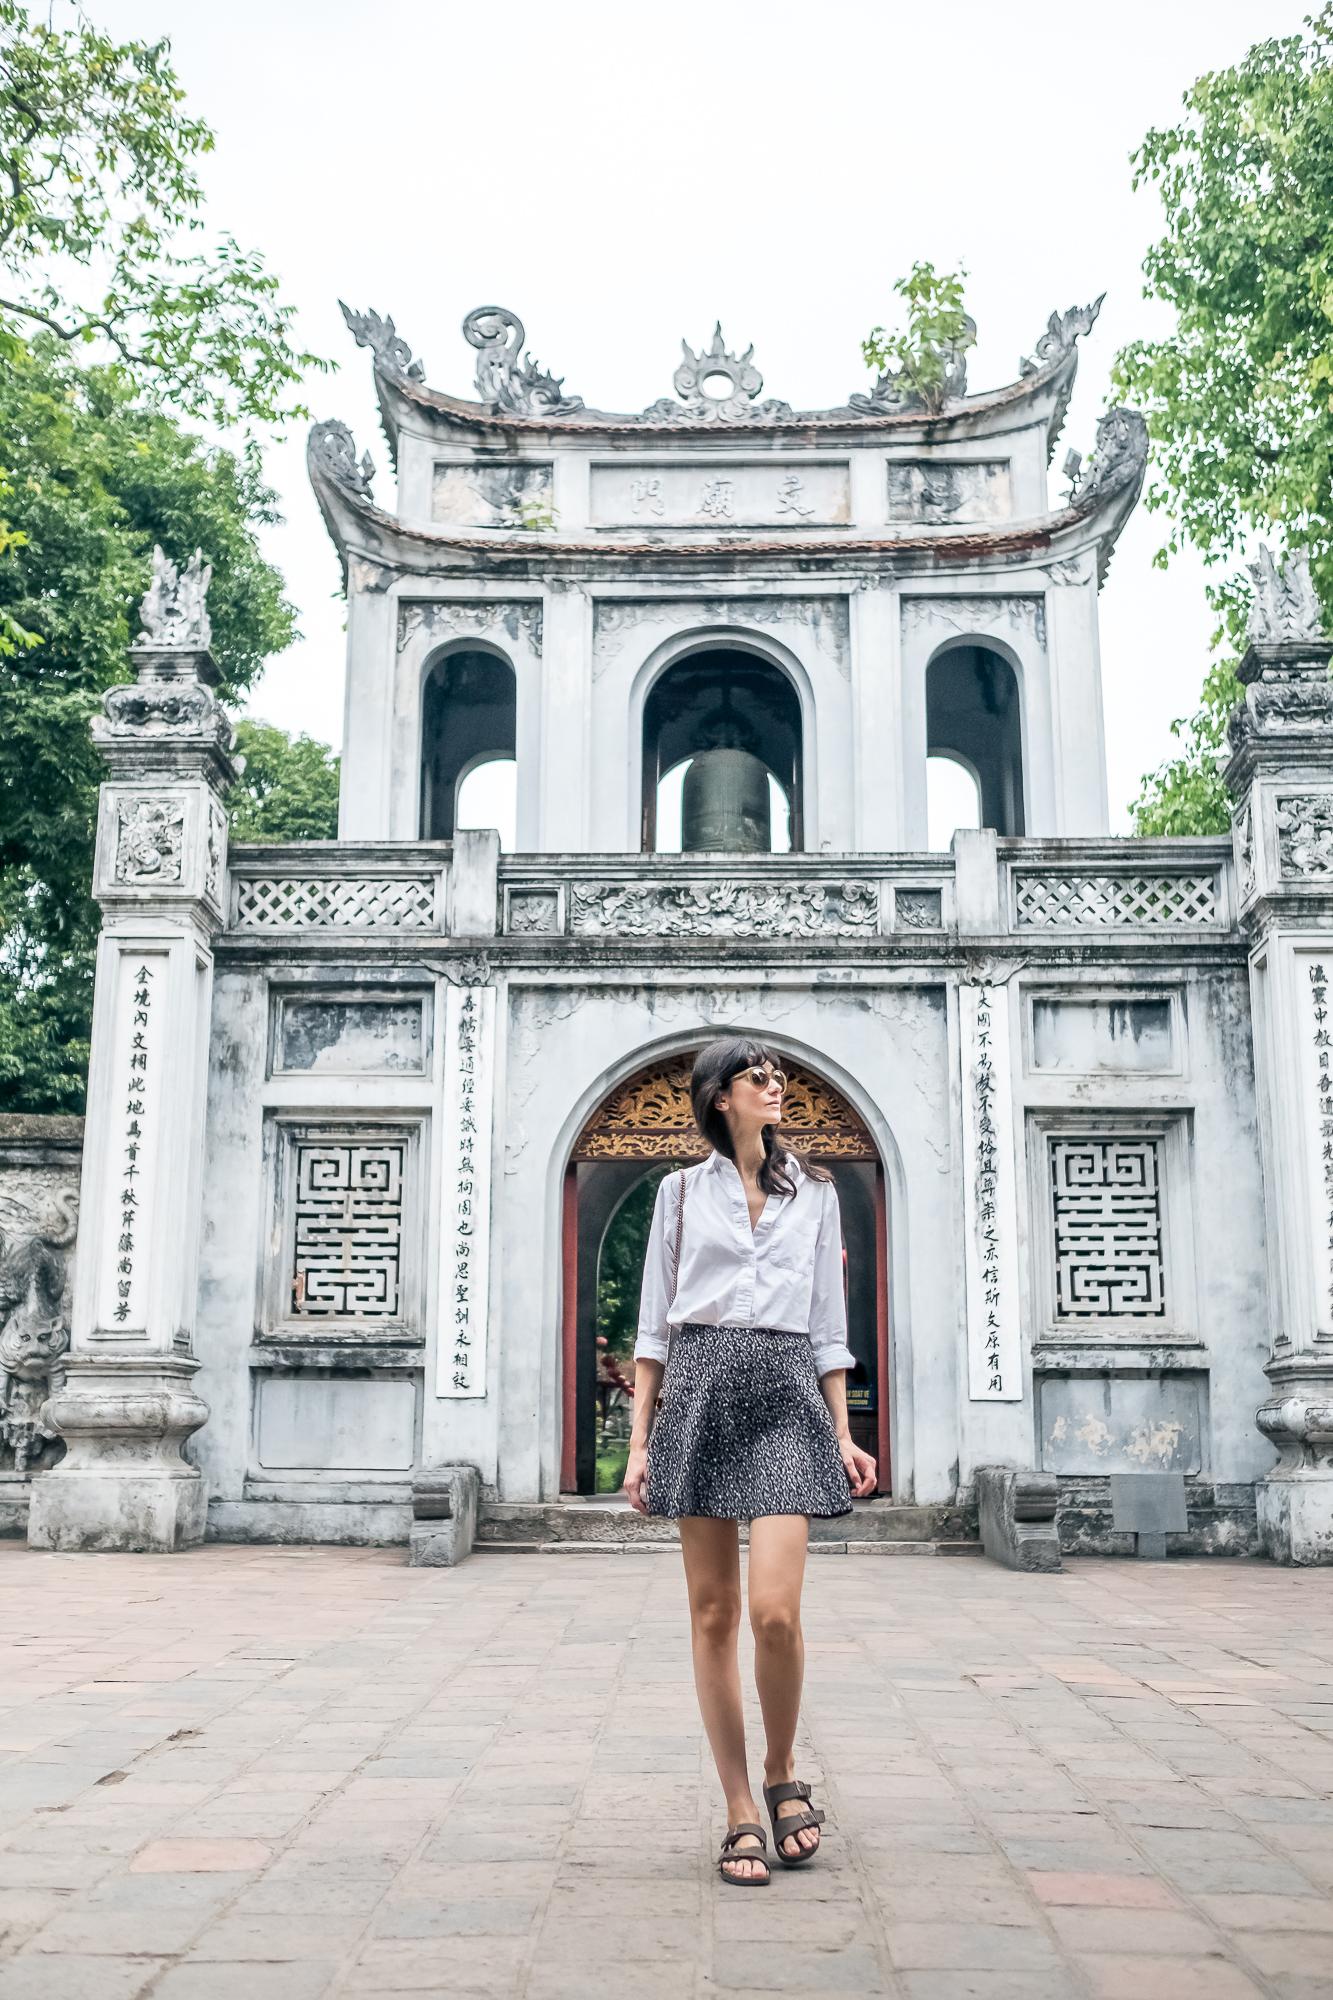 Vietnam_Honeymoon_TheOutsiderBlog_DSCF8009.JPG